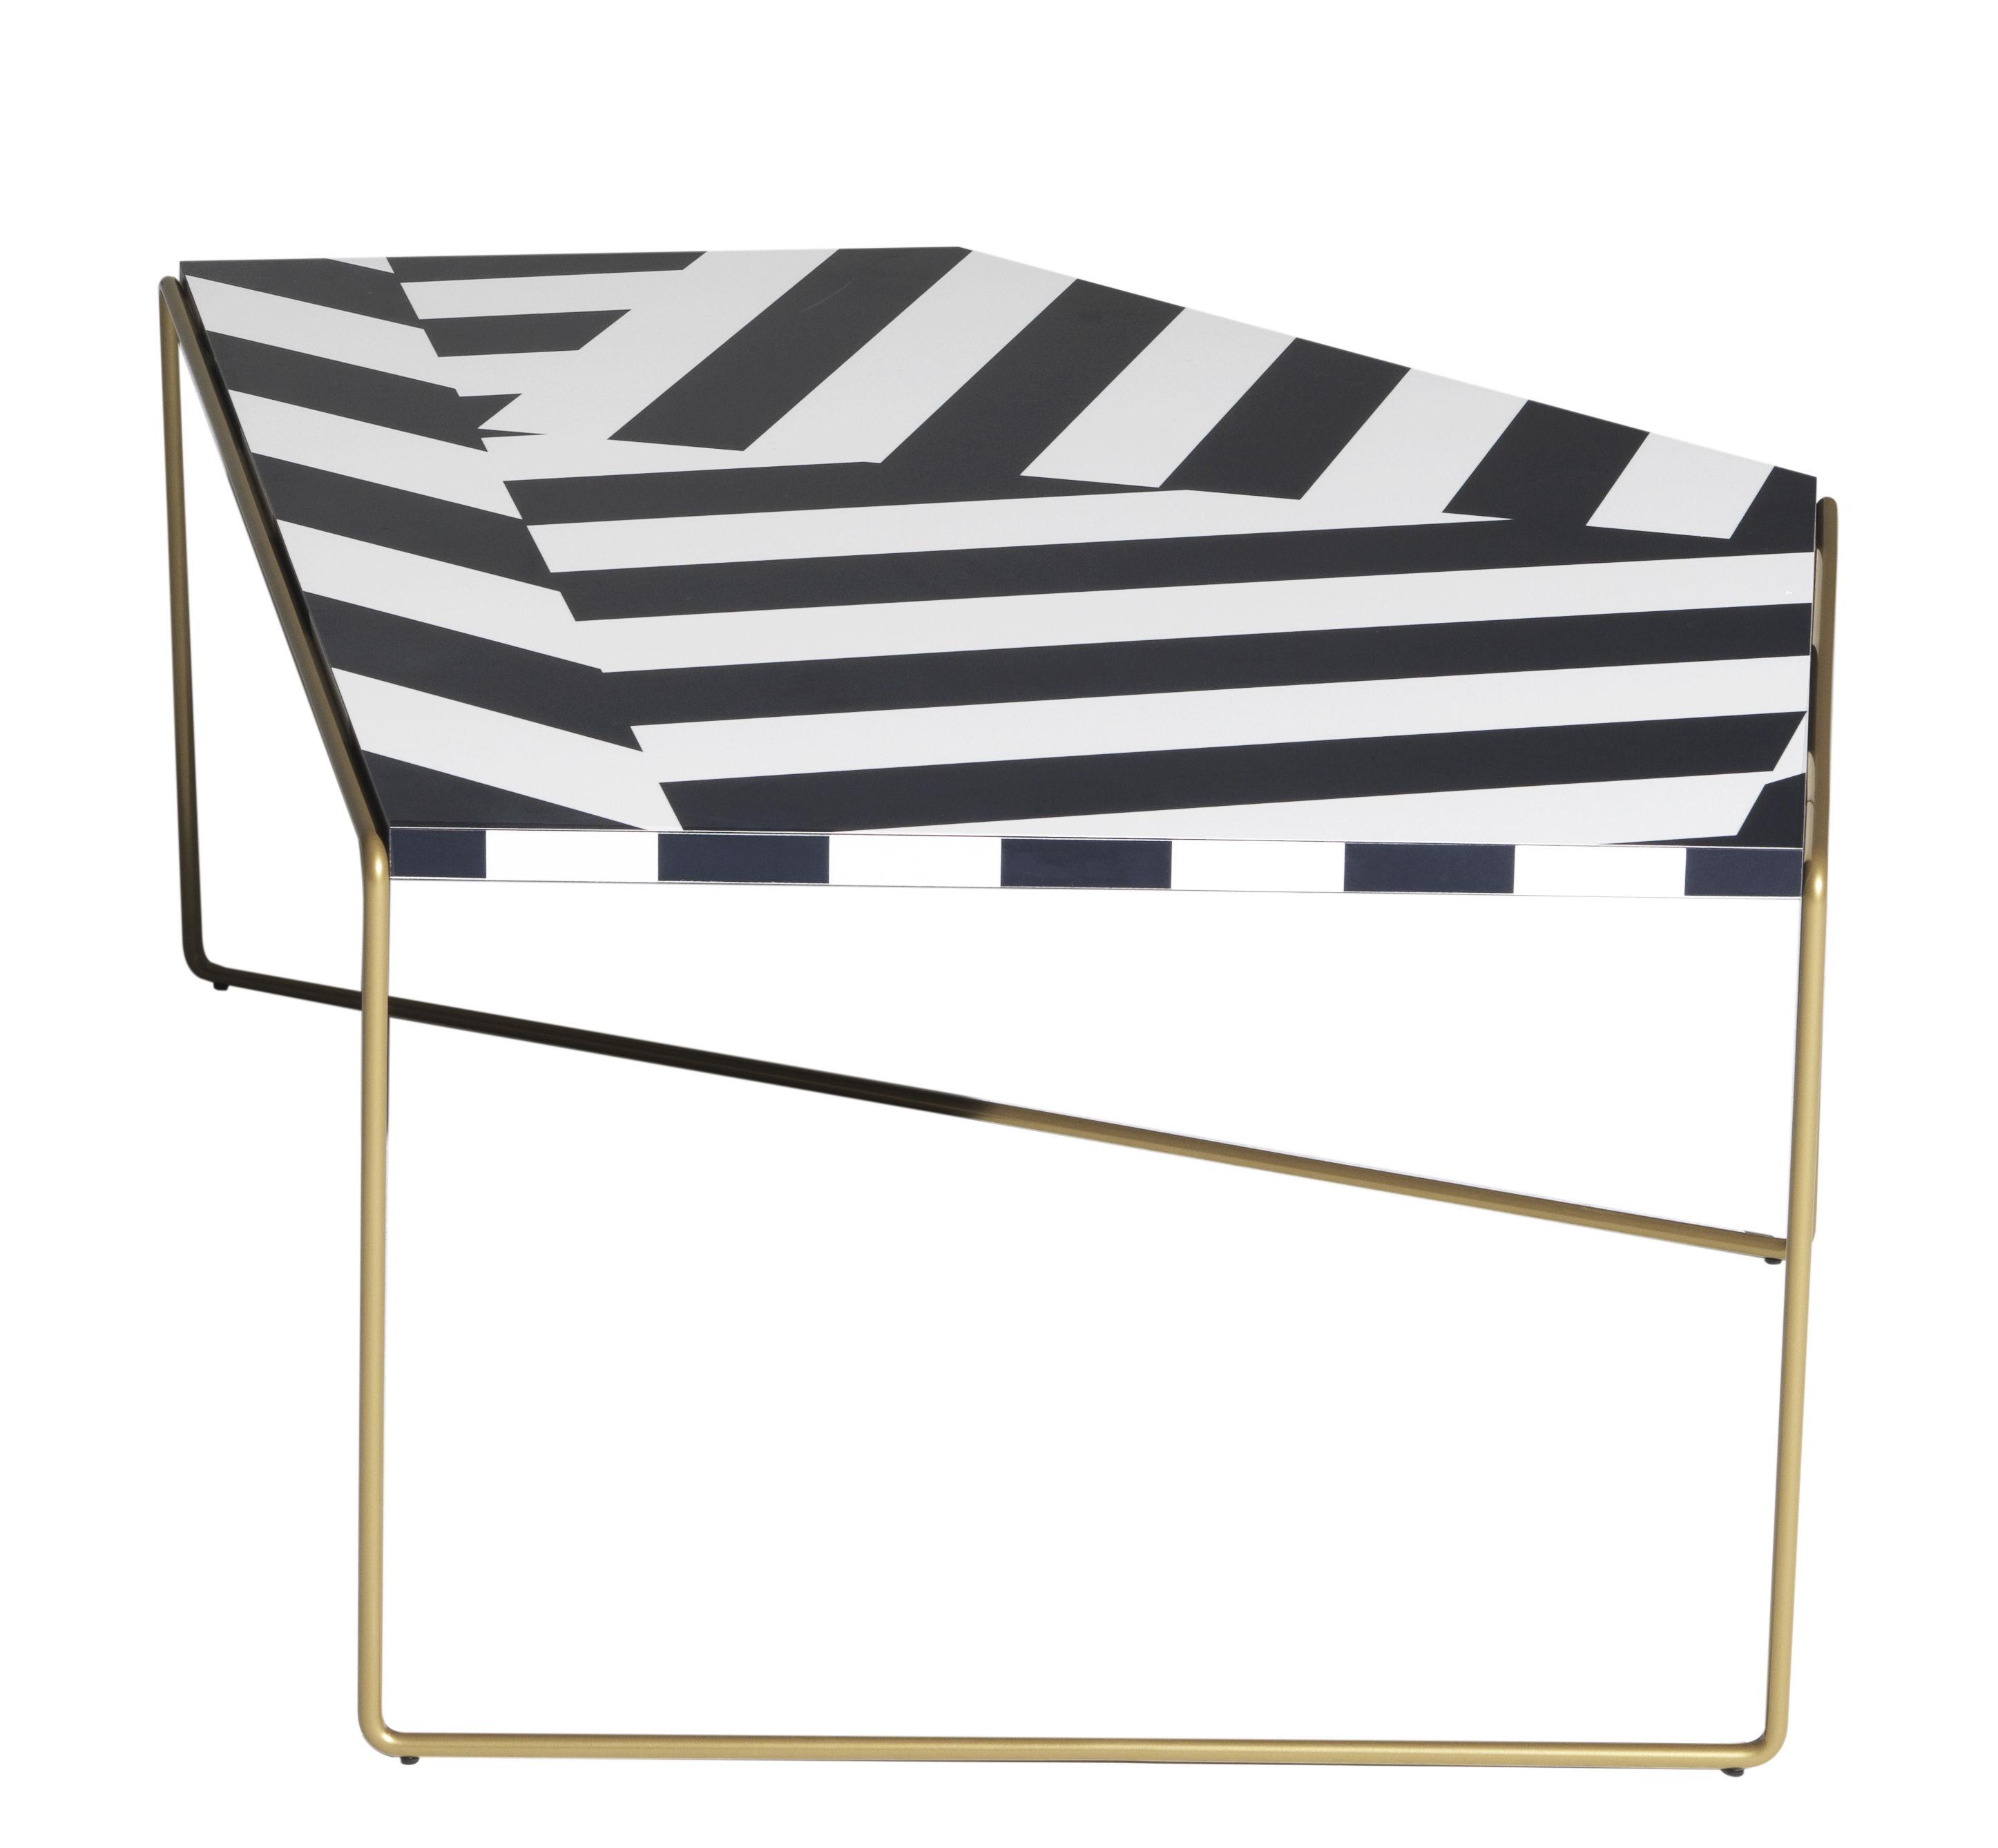 Furniture - Coffee Tables - Zagazig Coffee table - / 87 x 113 cm x H 47 cm by Driade - Black stripes - HPL, Steel